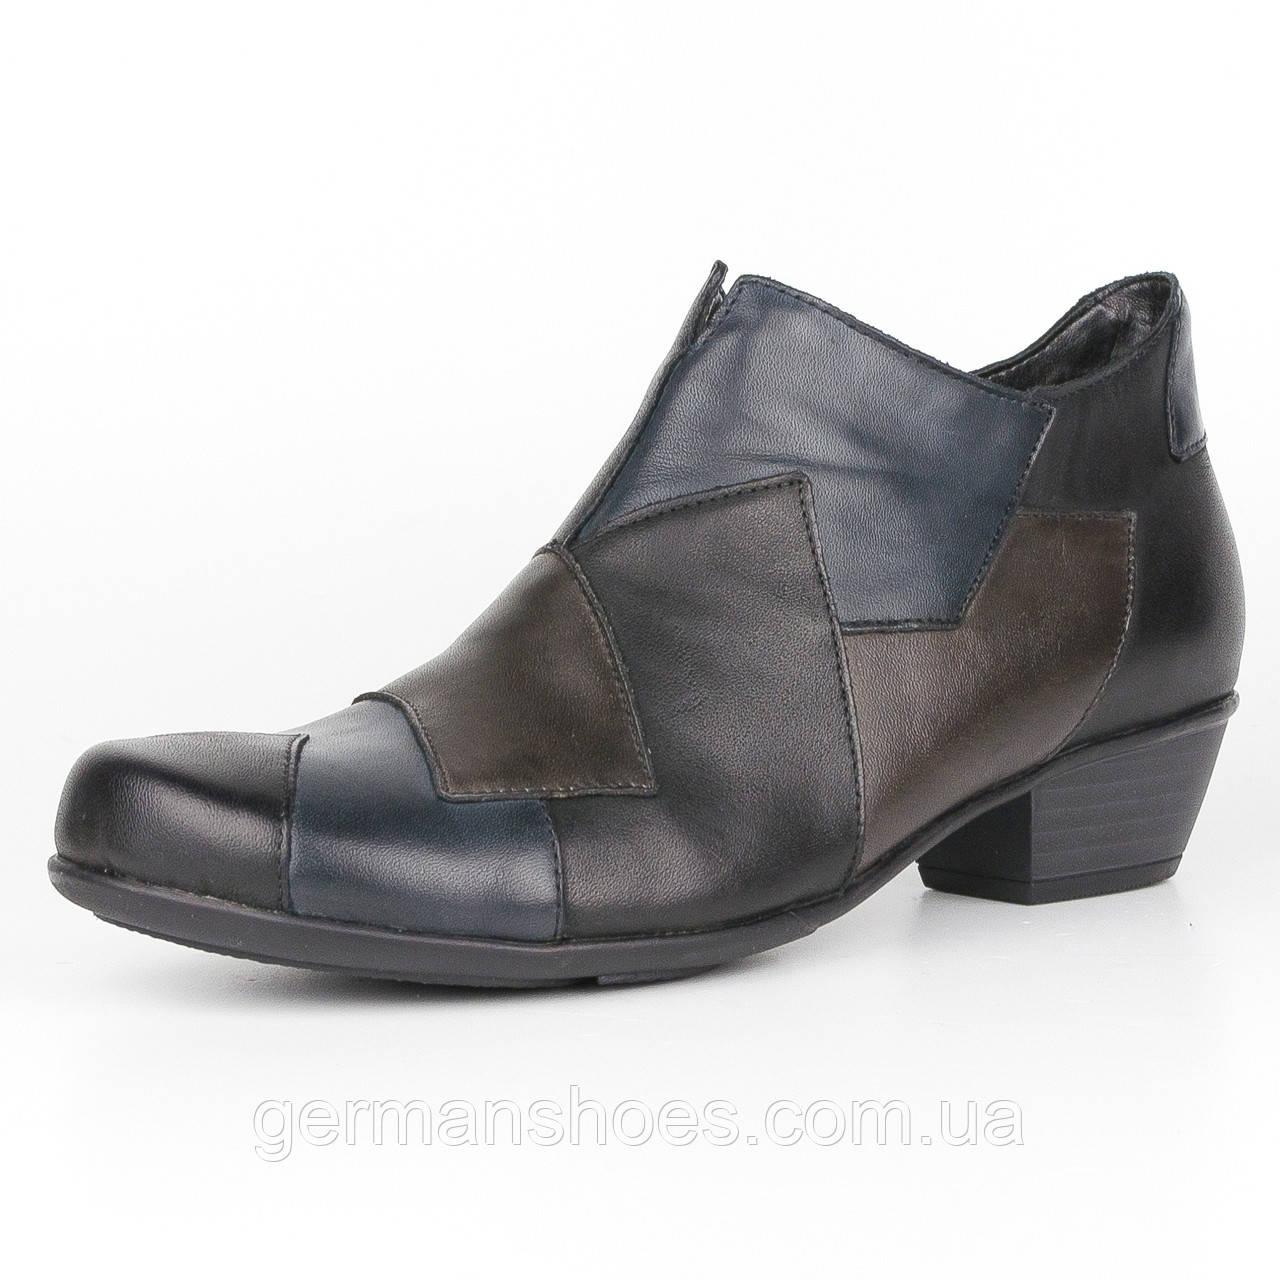 Ботинки женские Remonte D7386-21